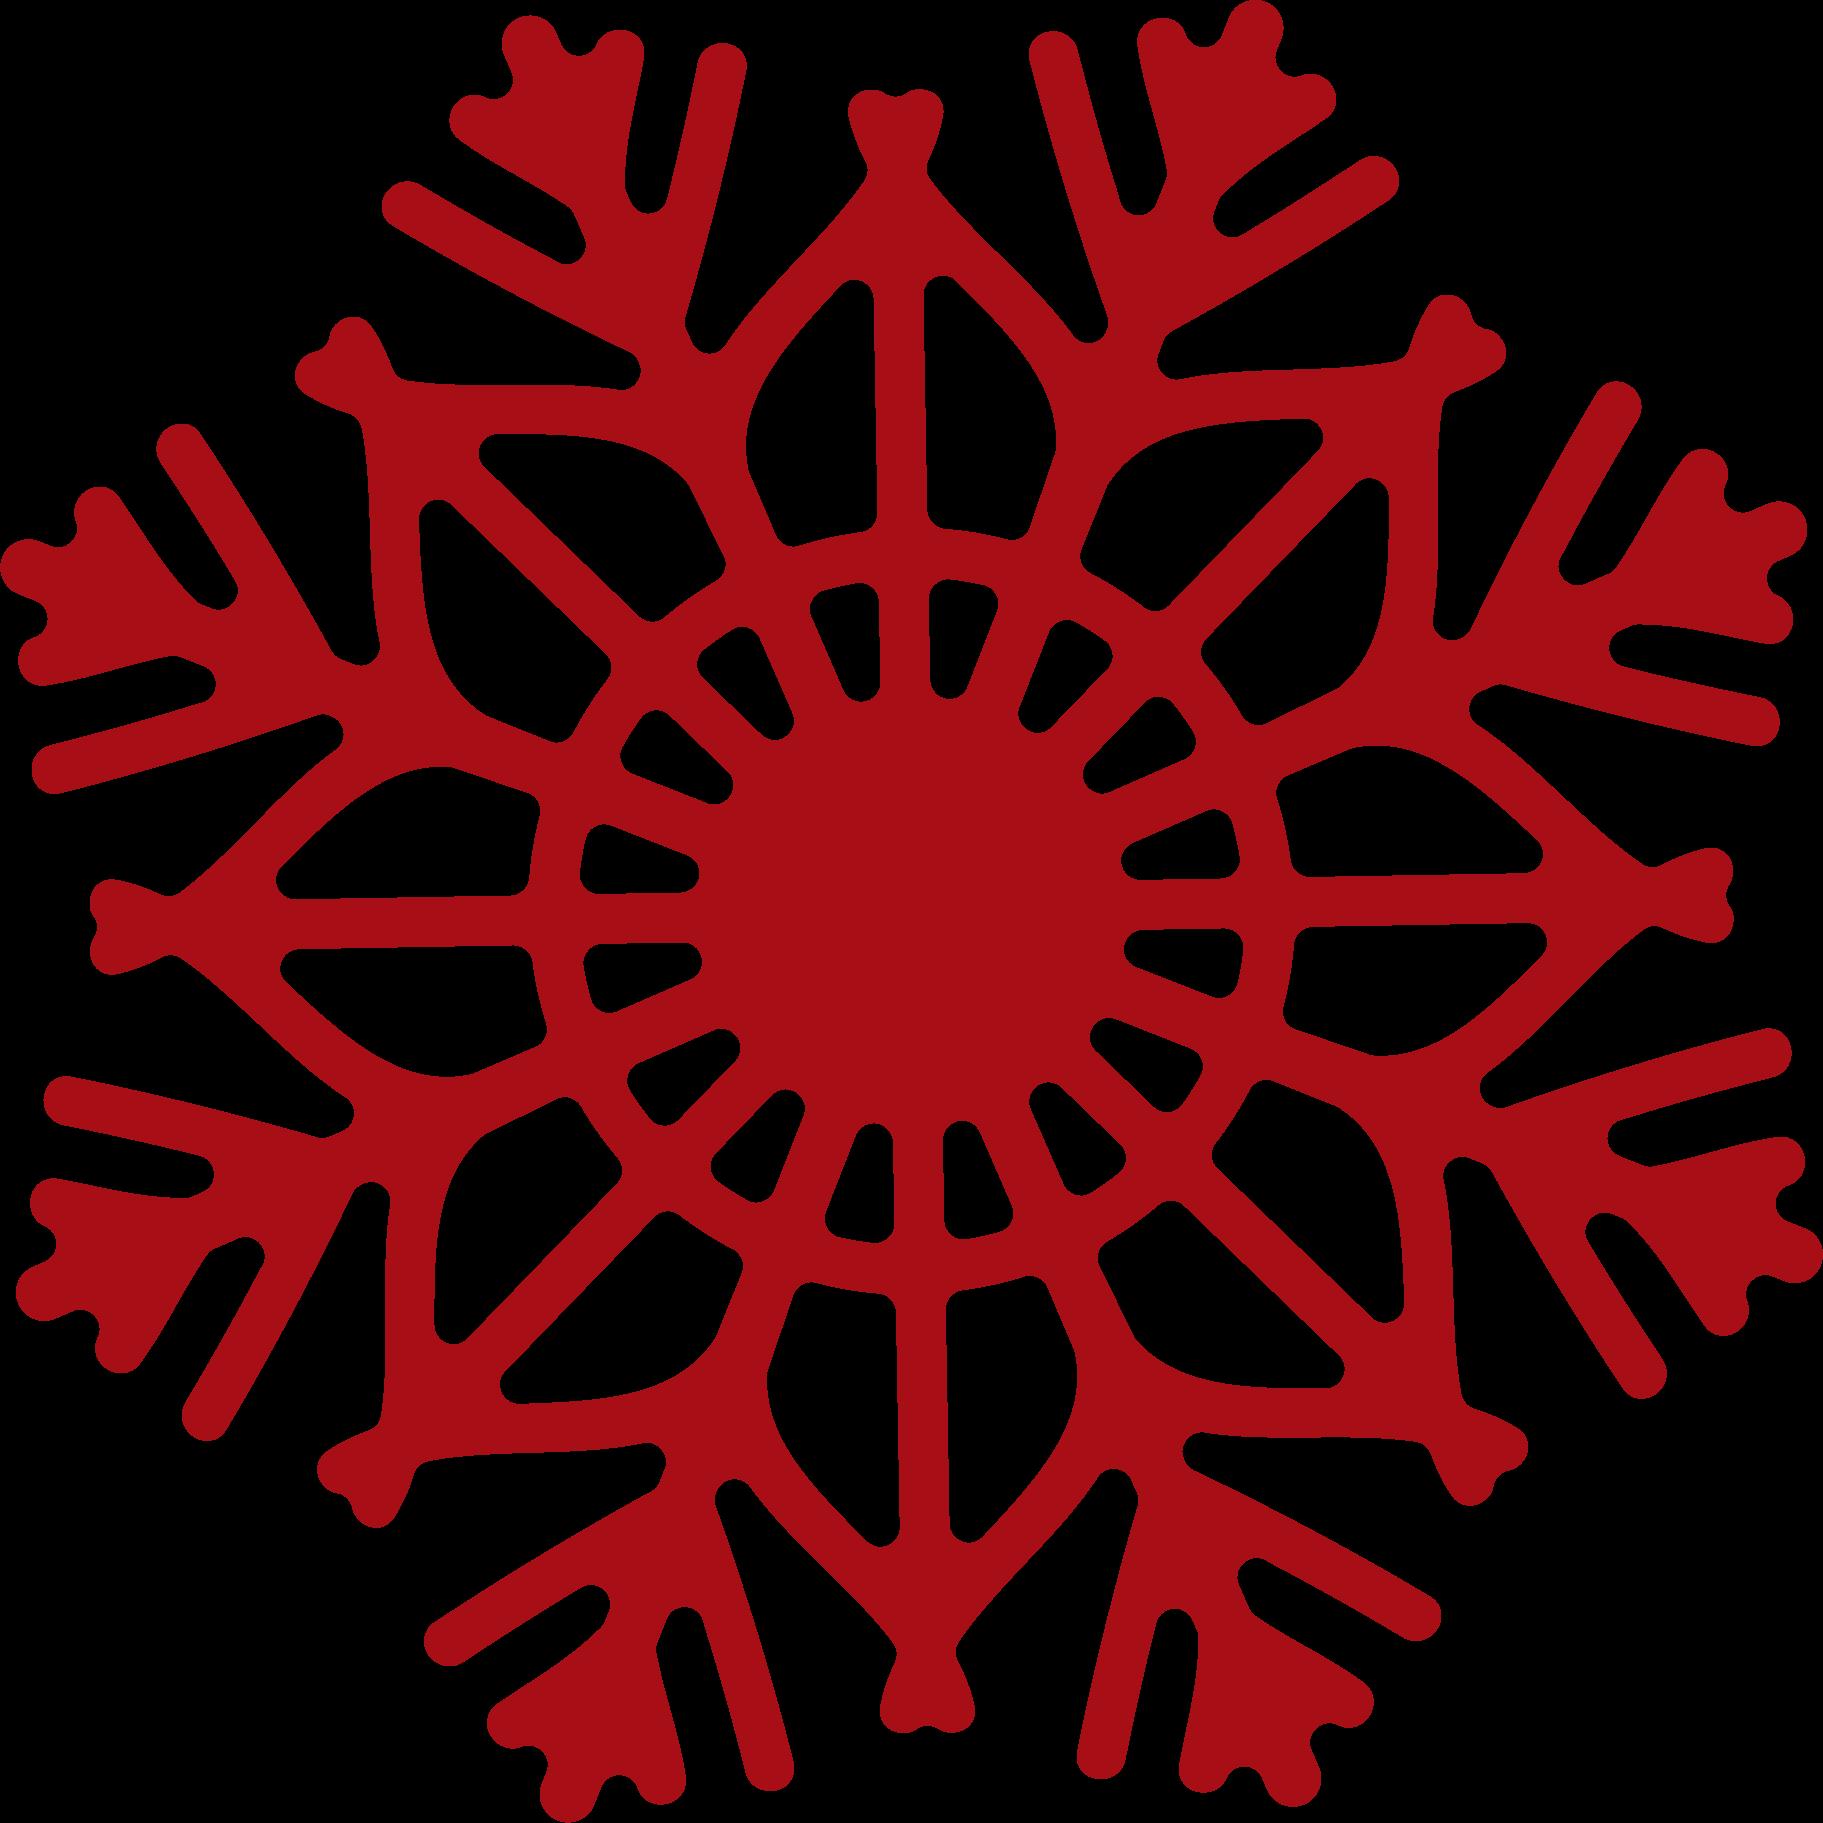 Snowflake 4 SVG Cut File